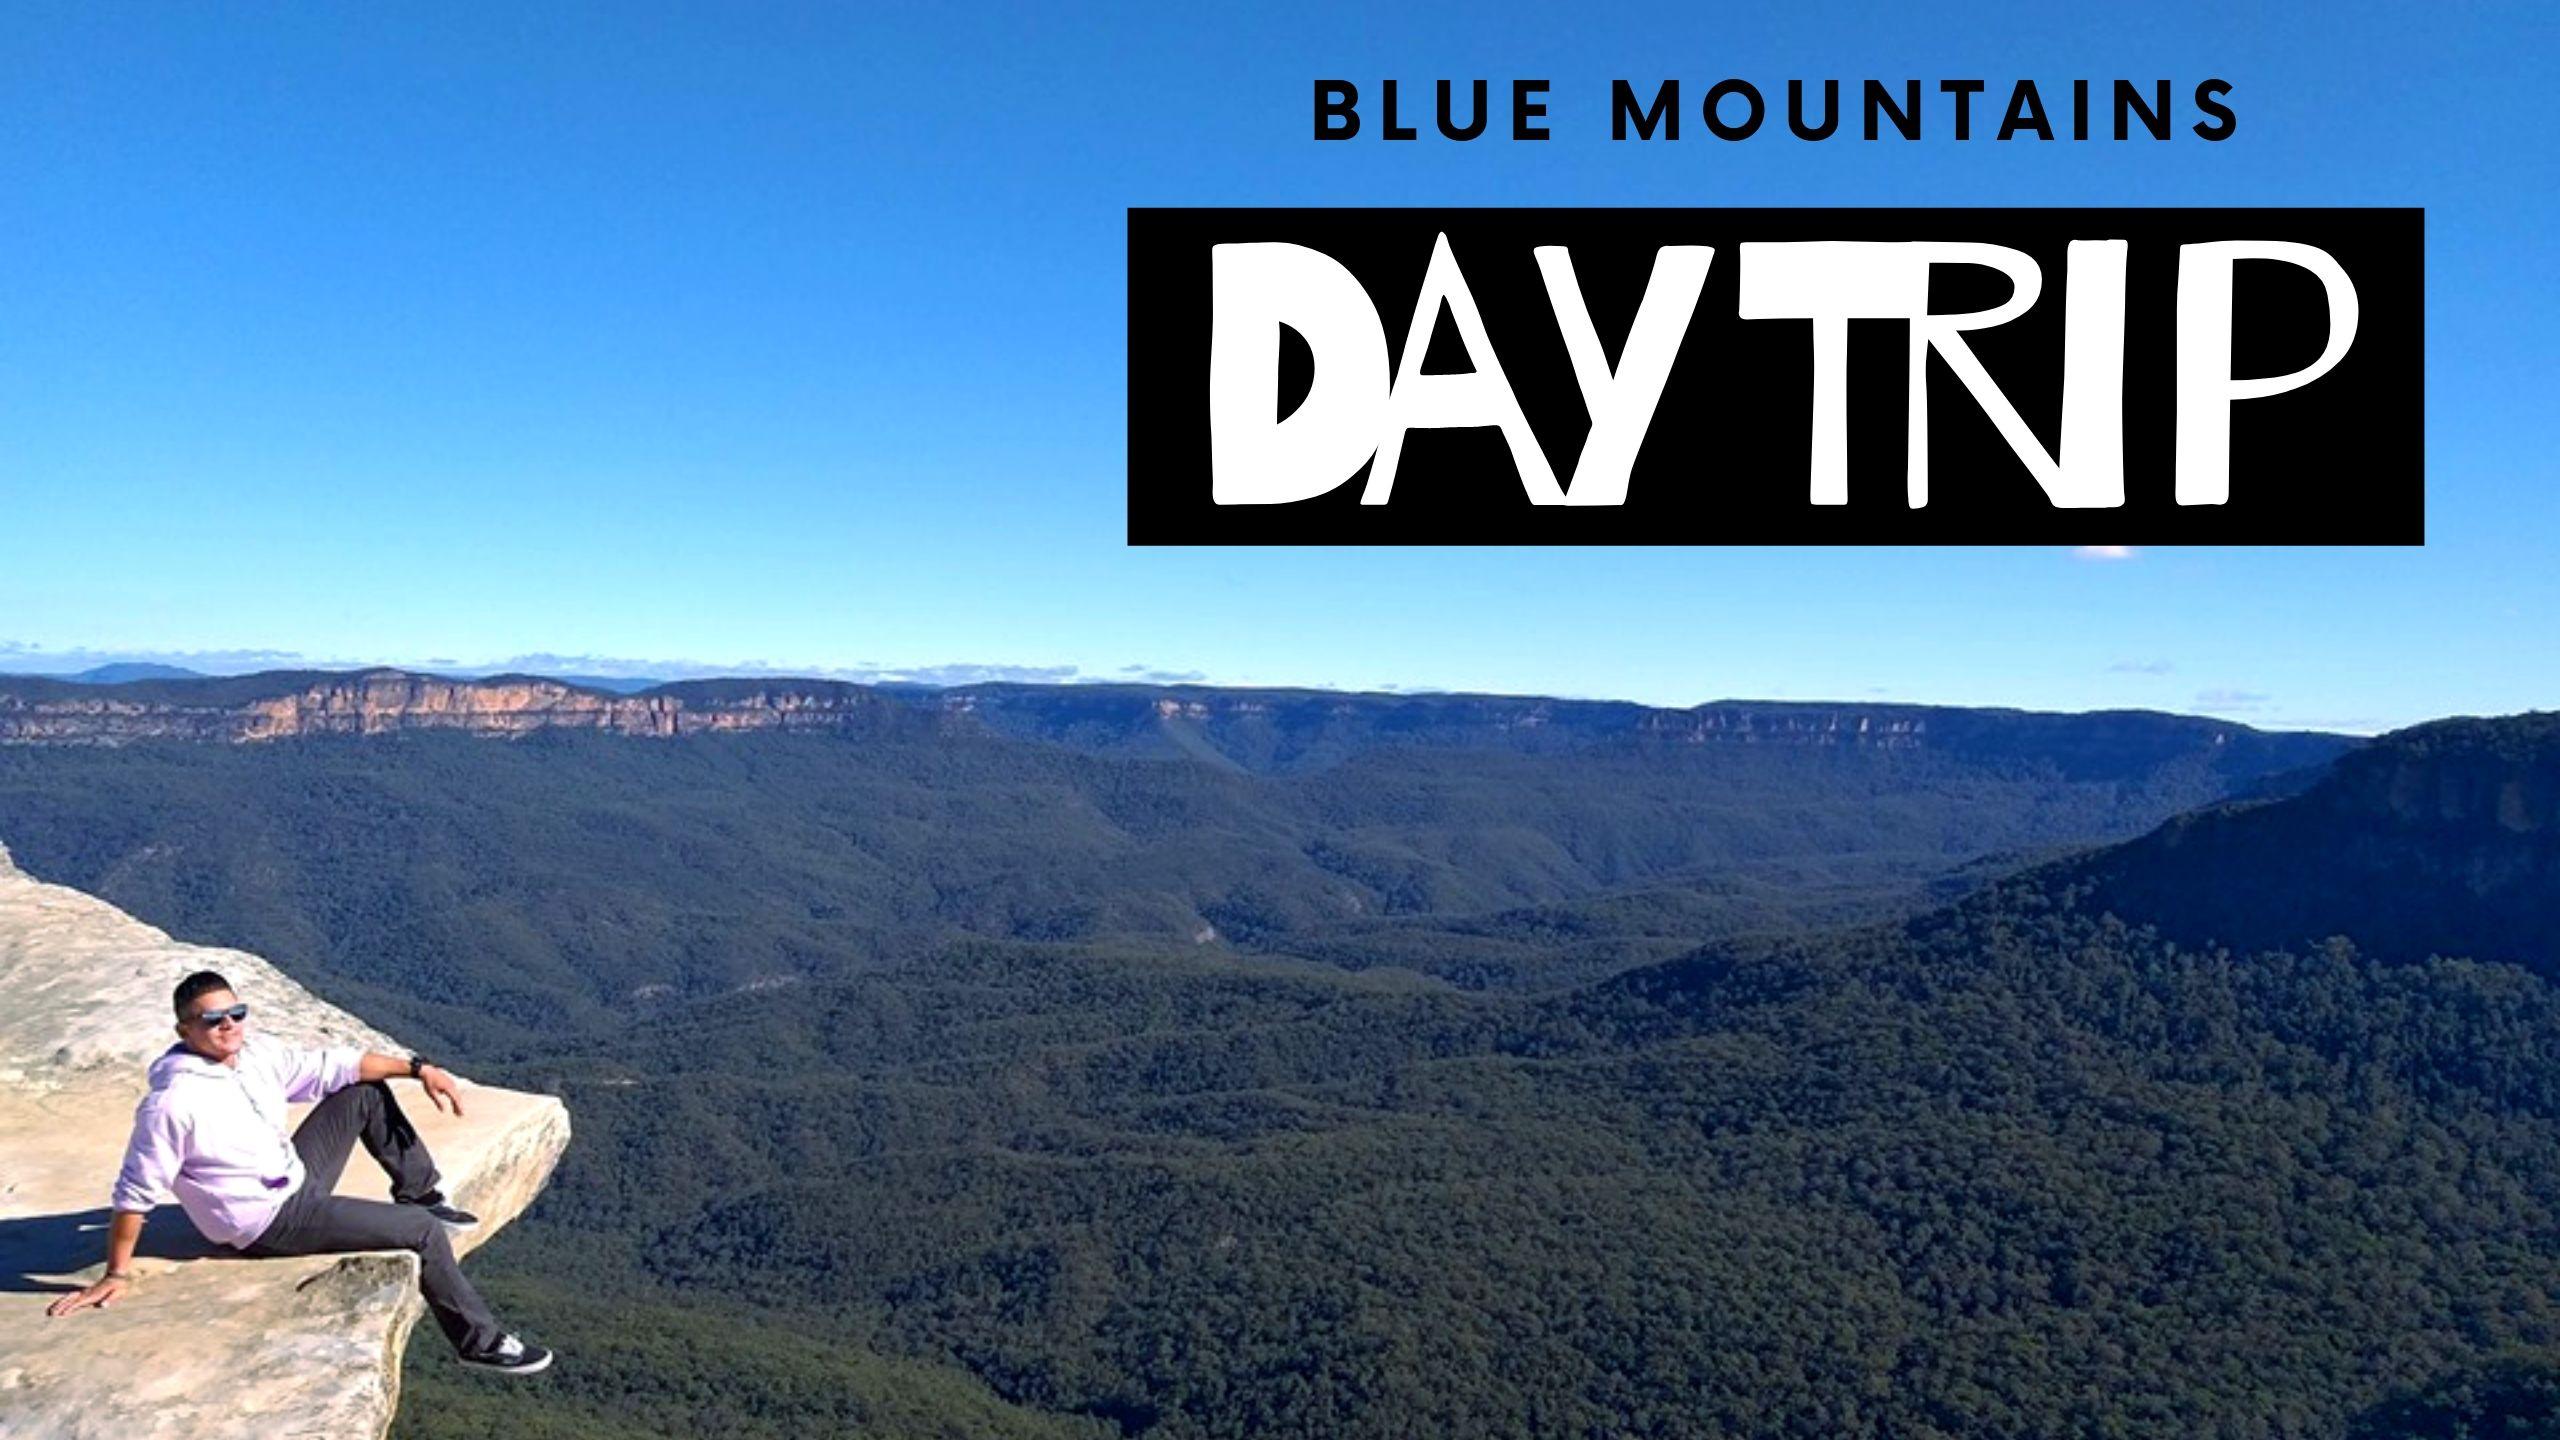 Blue Mountains Day Trip, Blue Mountains Day Trip